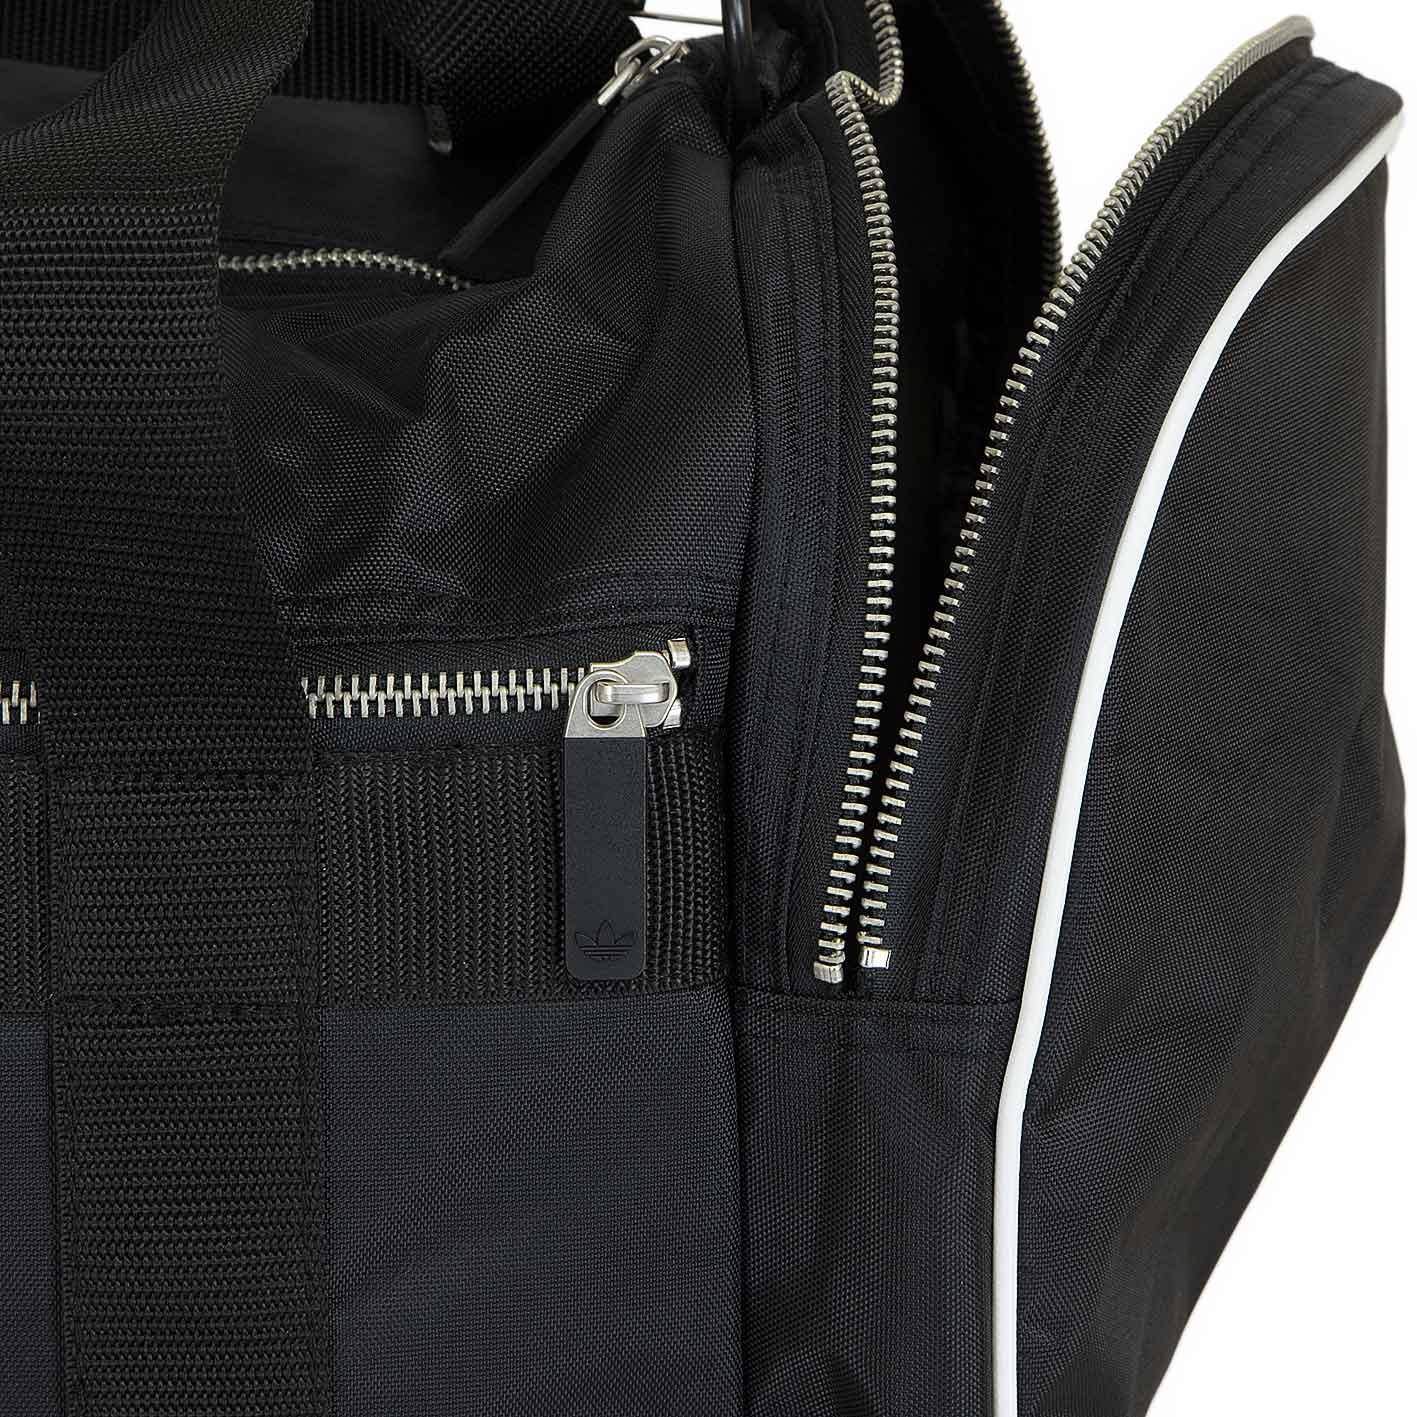 Adidas Originals Bag Duffle Large schwarz